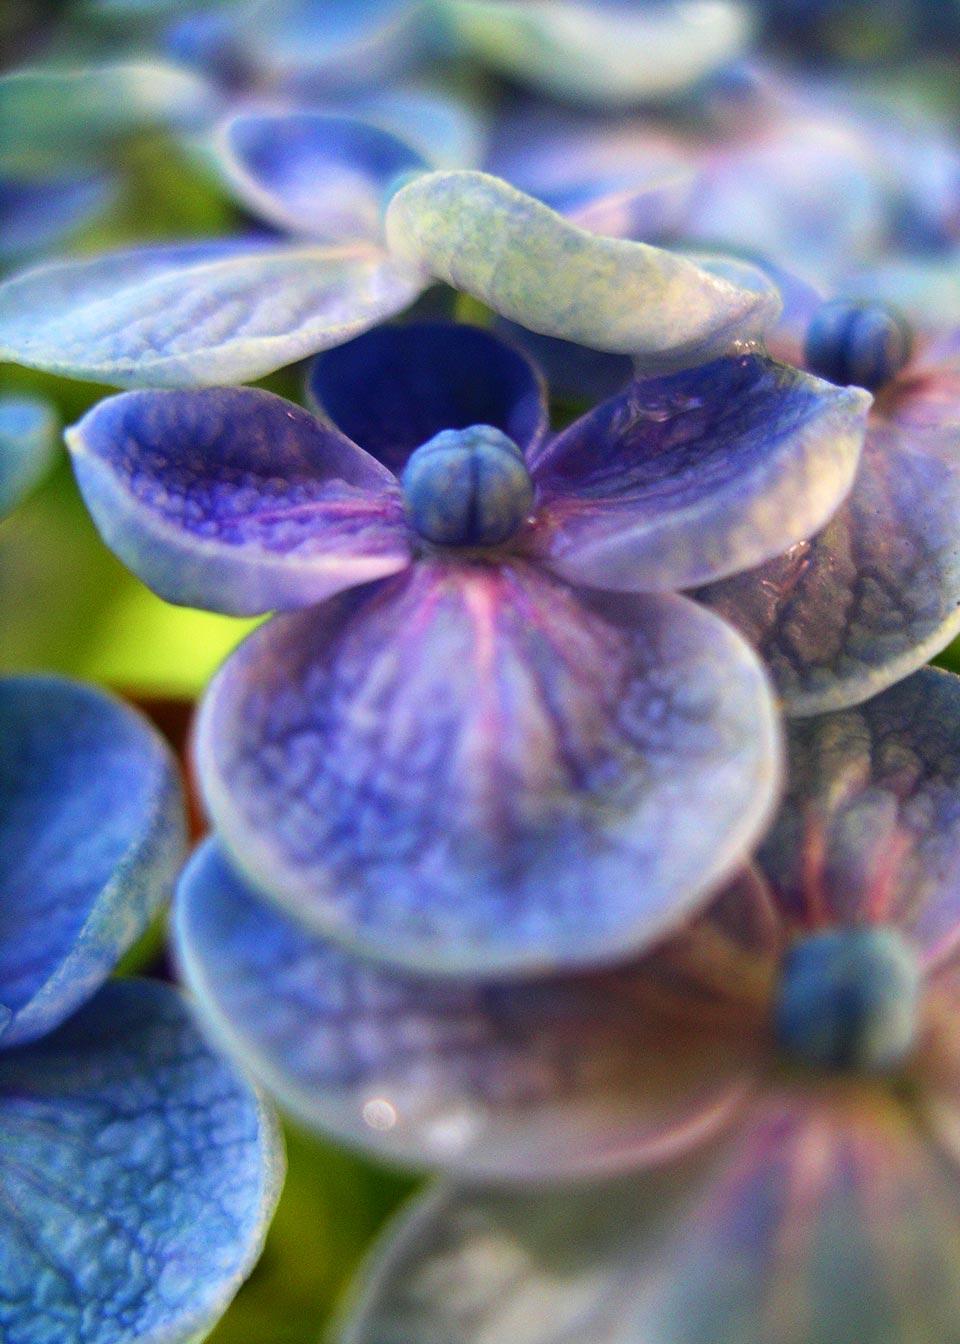 Hydragena petals